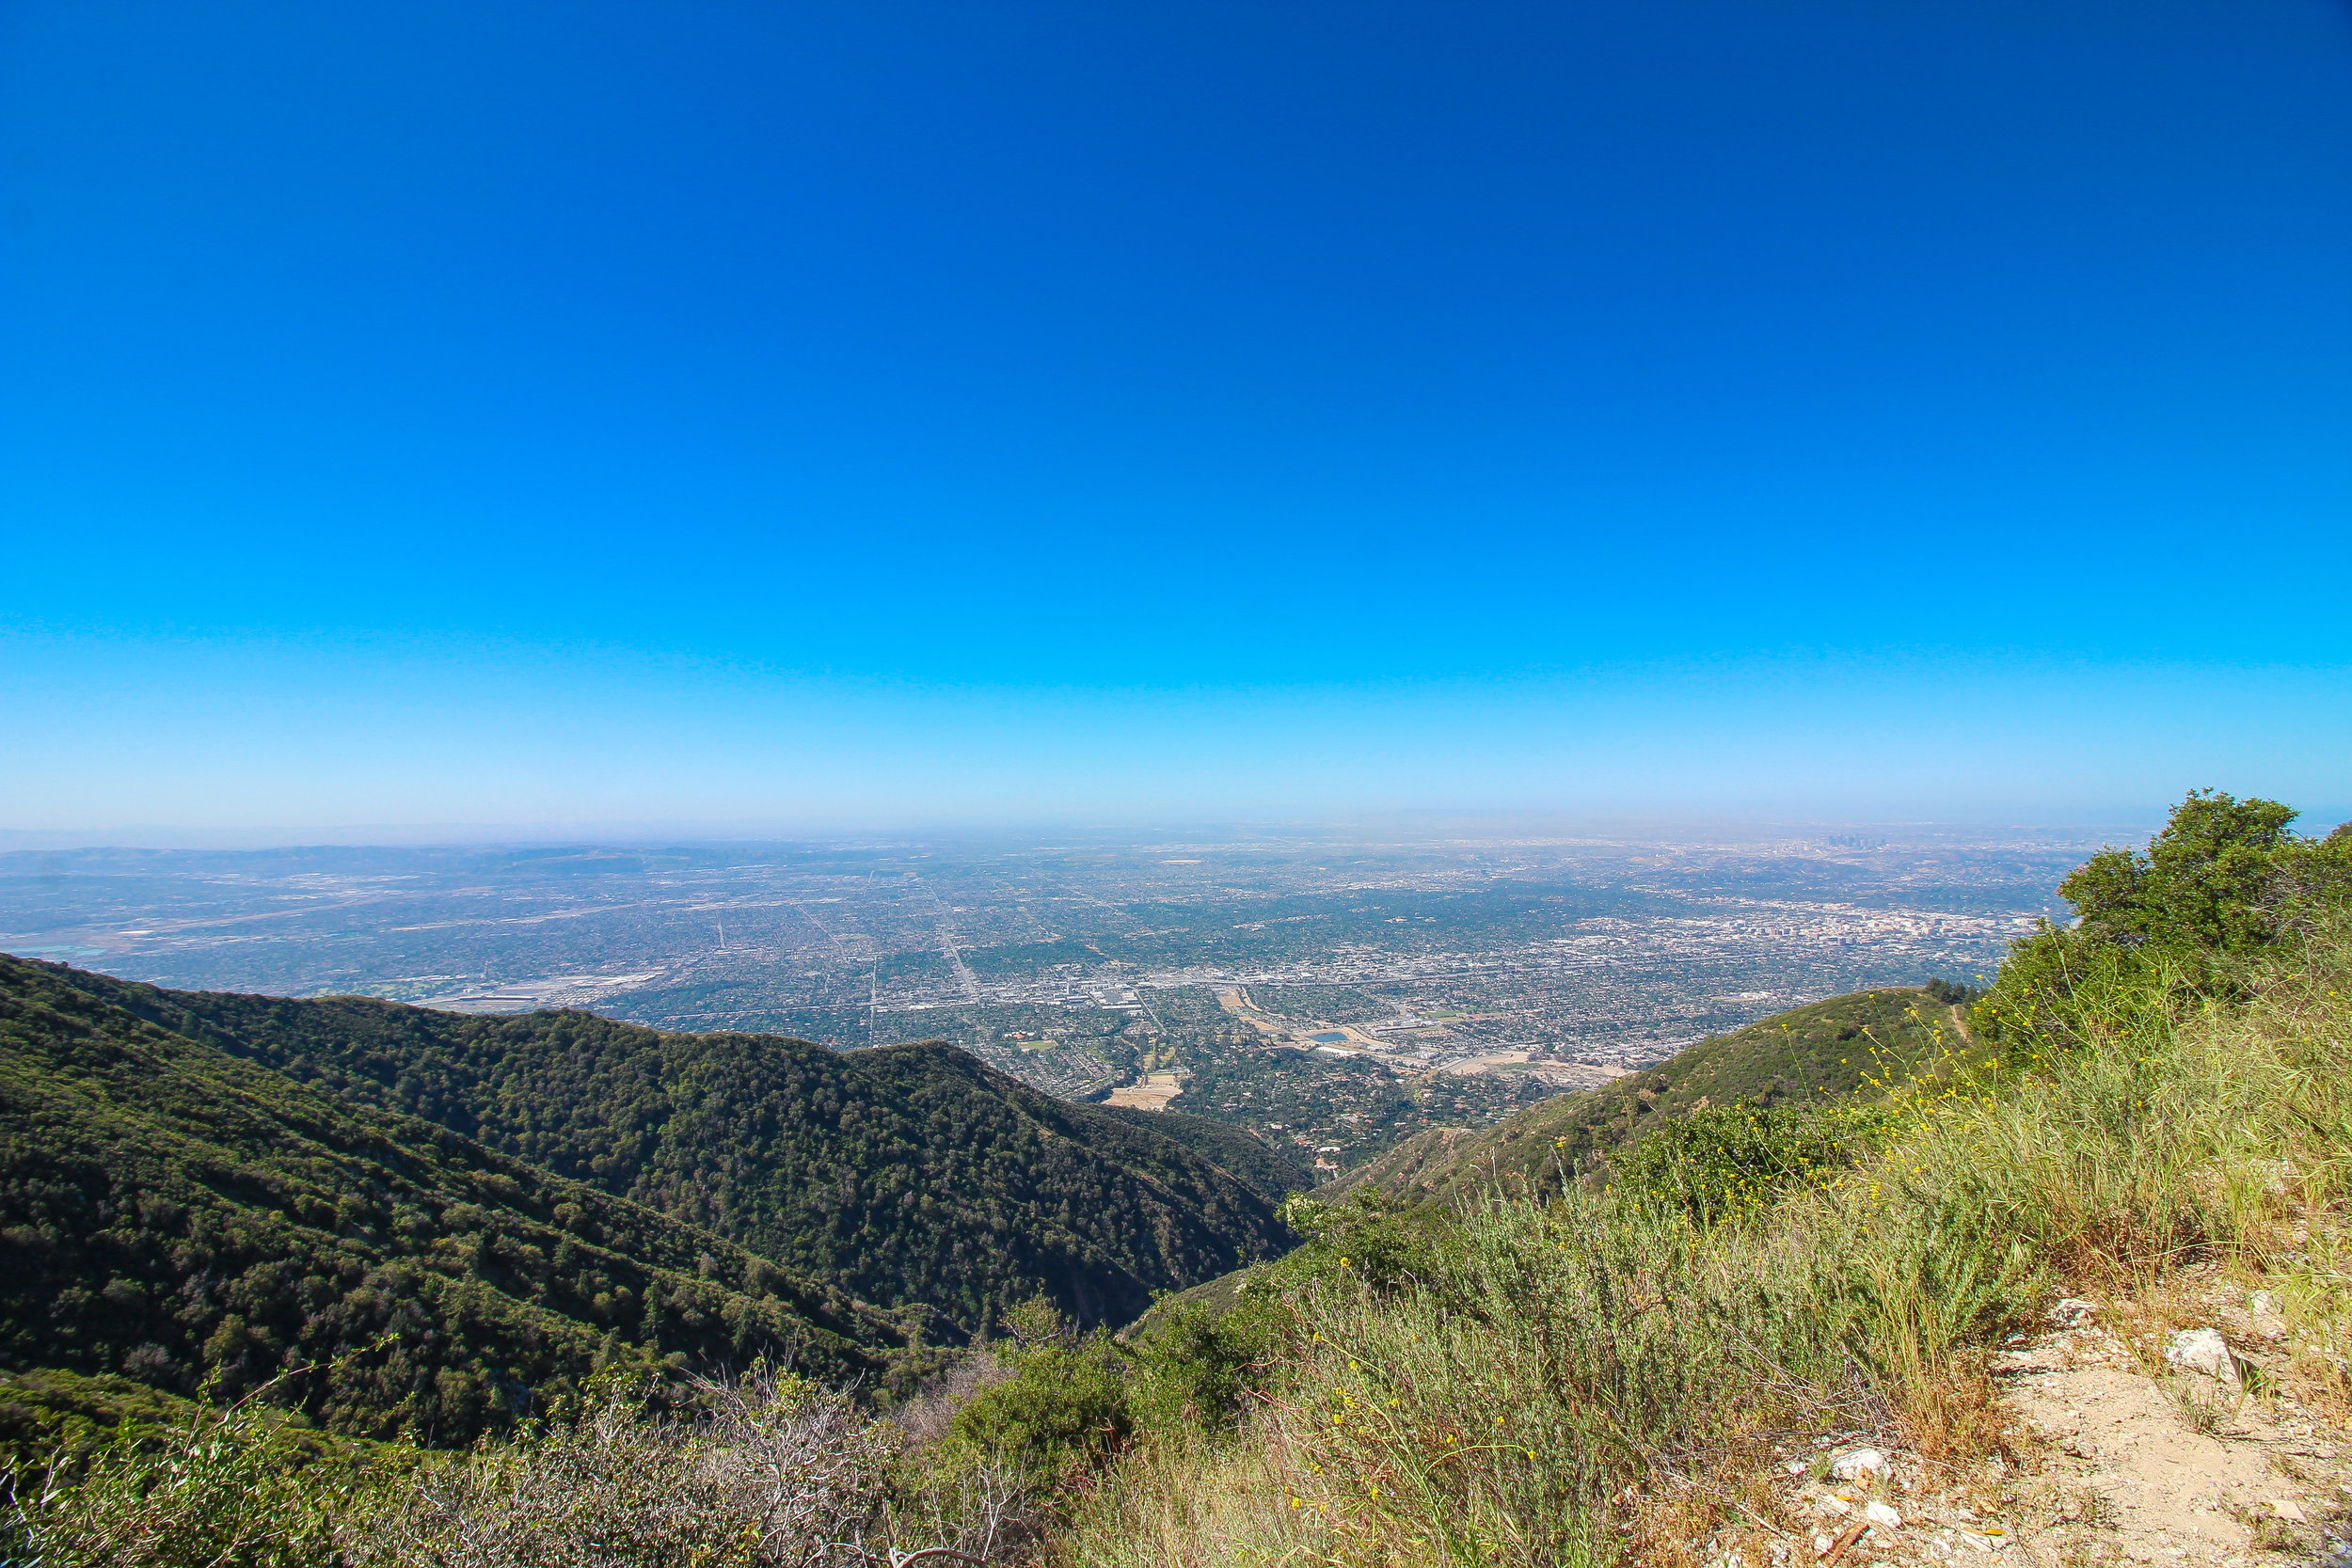 The LA Basin as seen along the path towards Mt. Wilson.